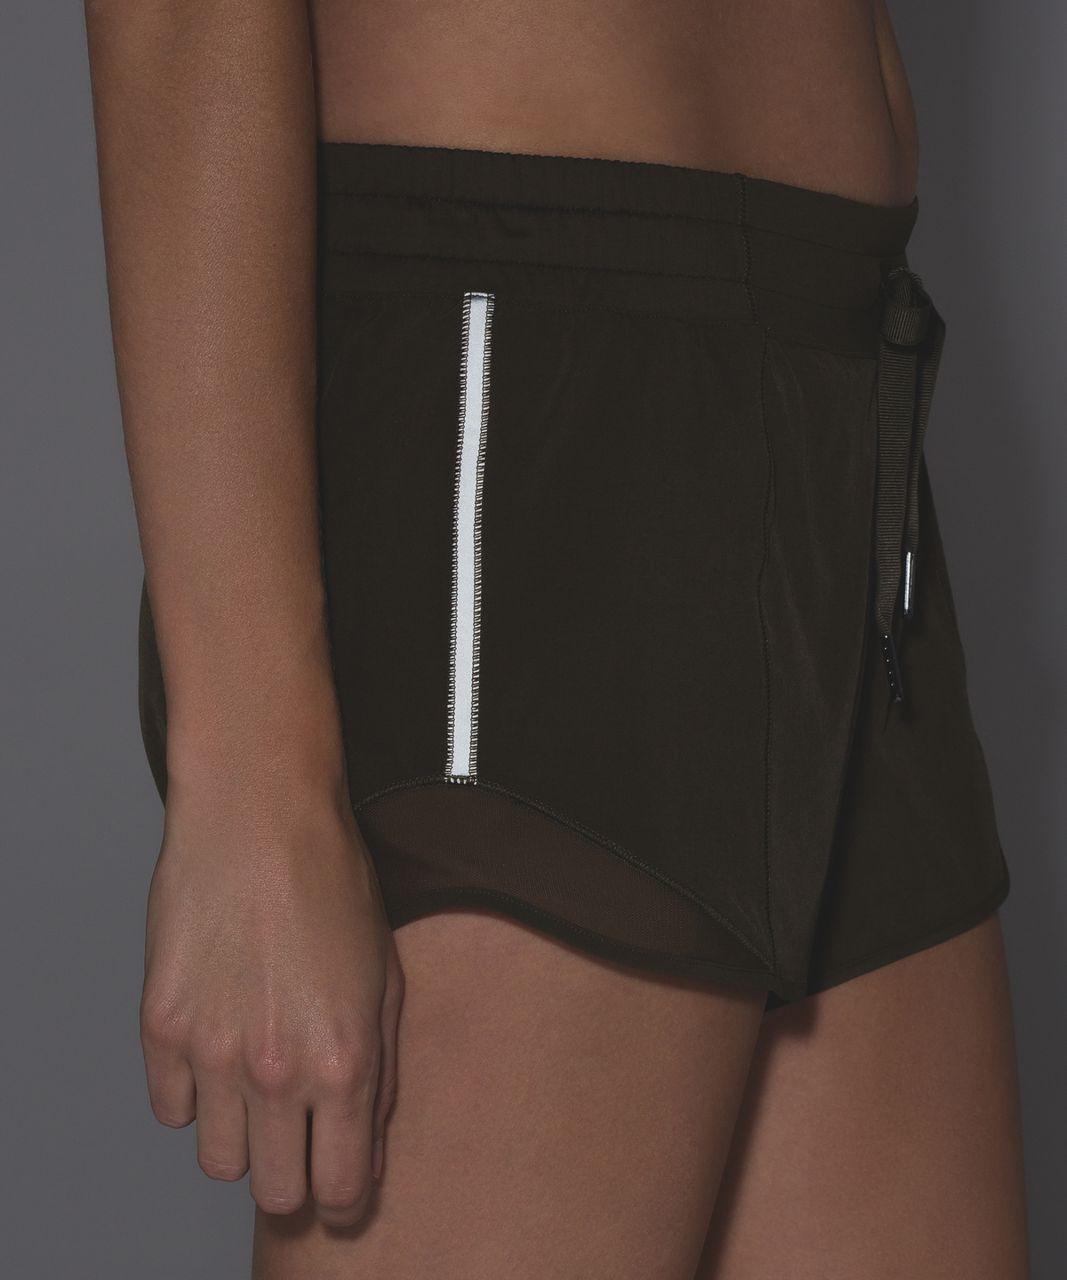 Lululemon Hotty Hot Short (Long) - Military Green